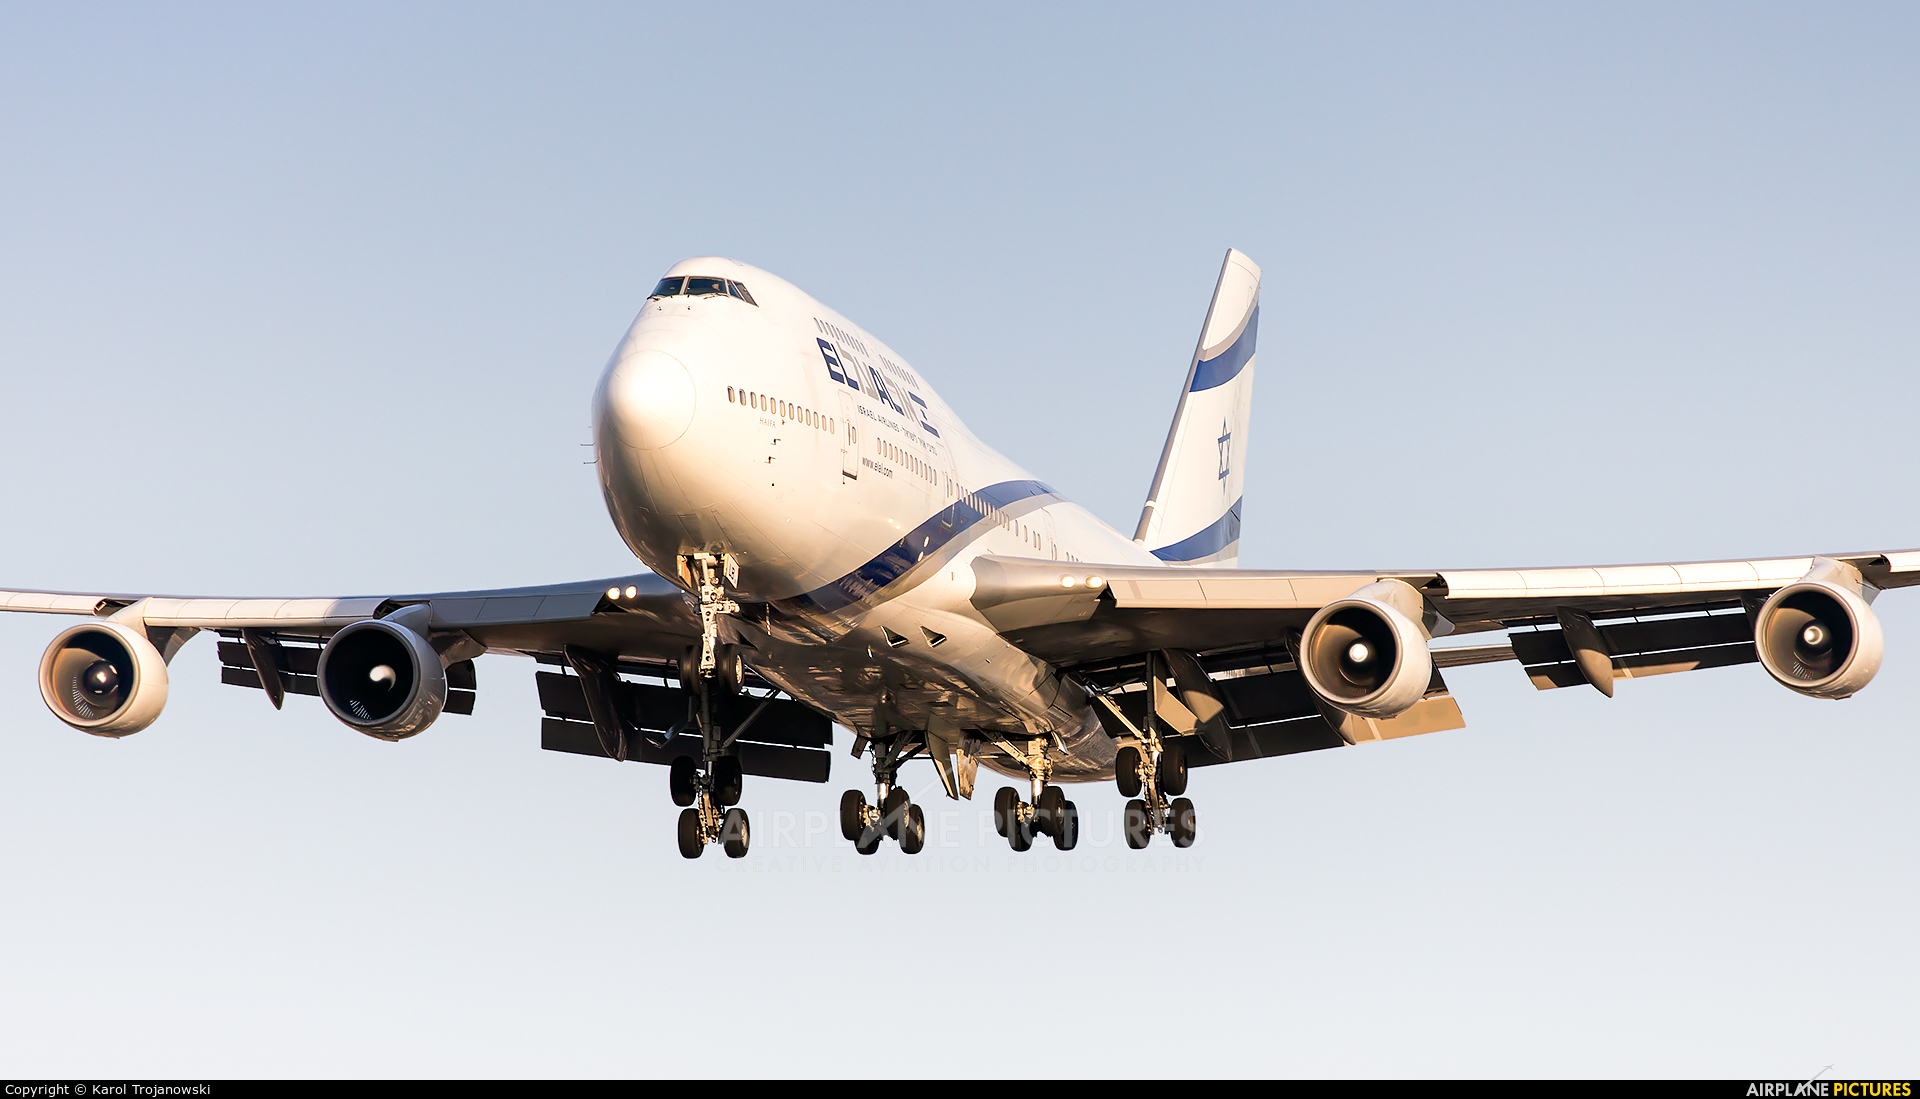 El Al Israel Airlines 4X-ELB aircraft at Warsaw - Frederic Chopin